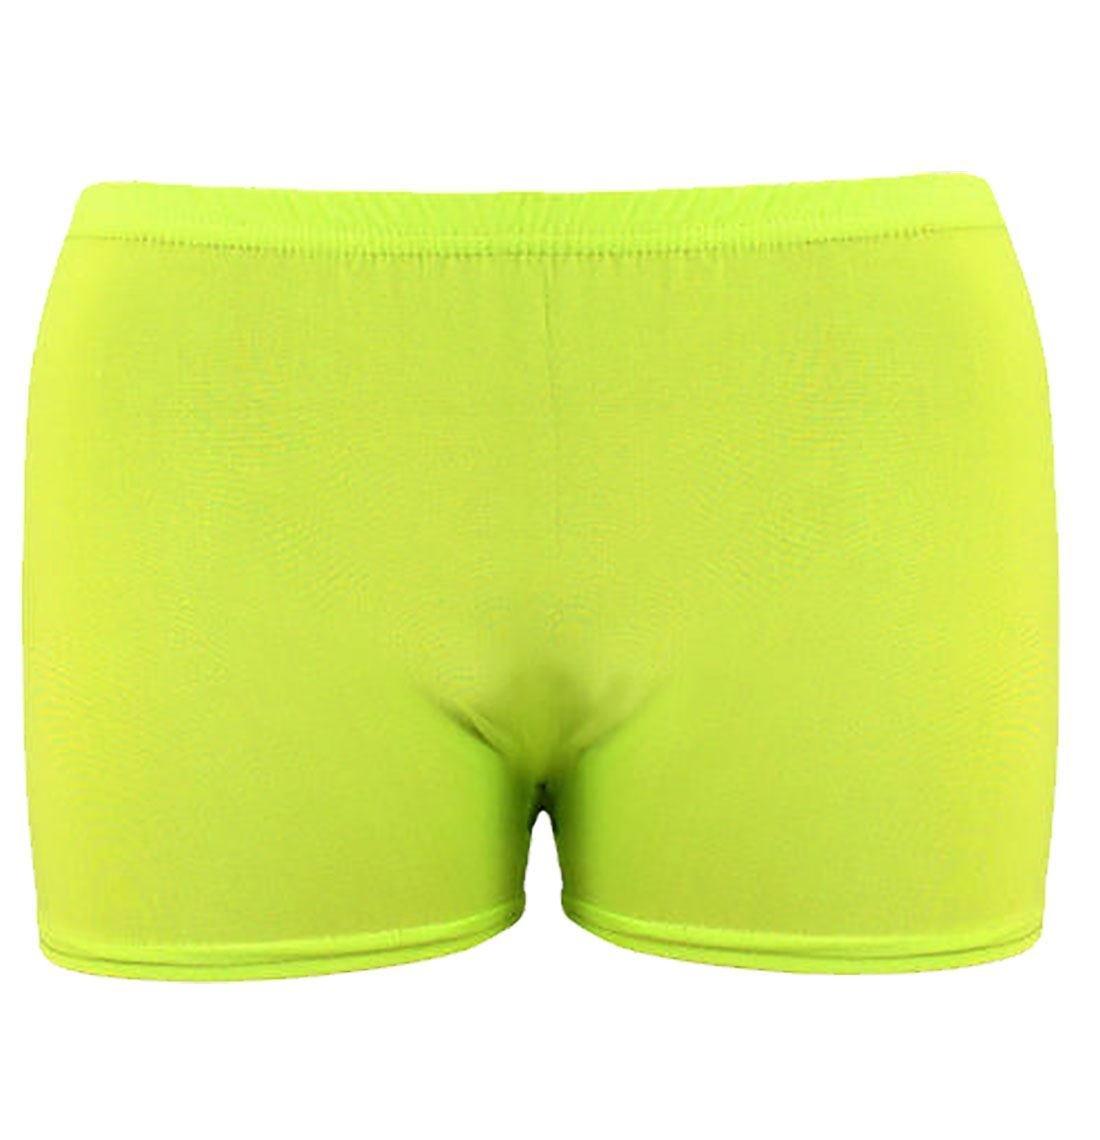 Rimi Hanger Children Plain Stretchy Neon Hot Pants Girls Dance Gym Lycra Party Tutu Shorts Neon Yellow 5-6 Years